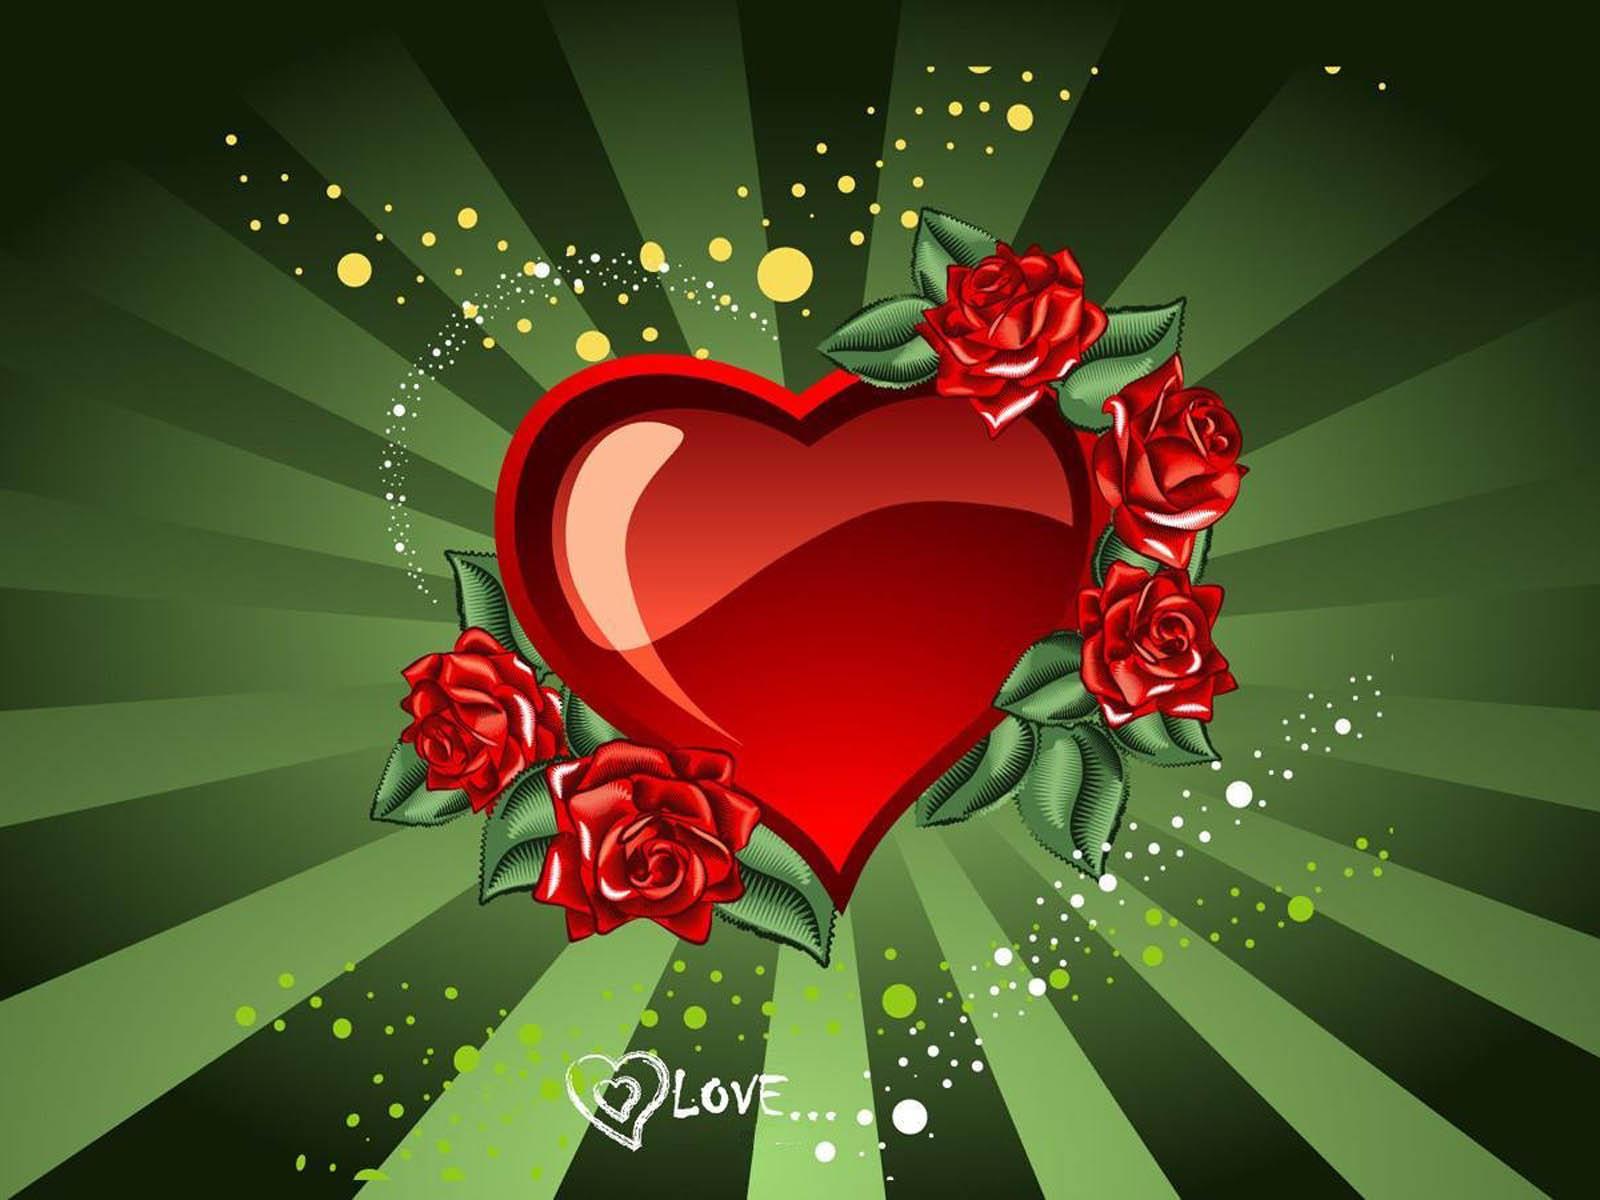 Wallpapers: Love Heart Wallpapers